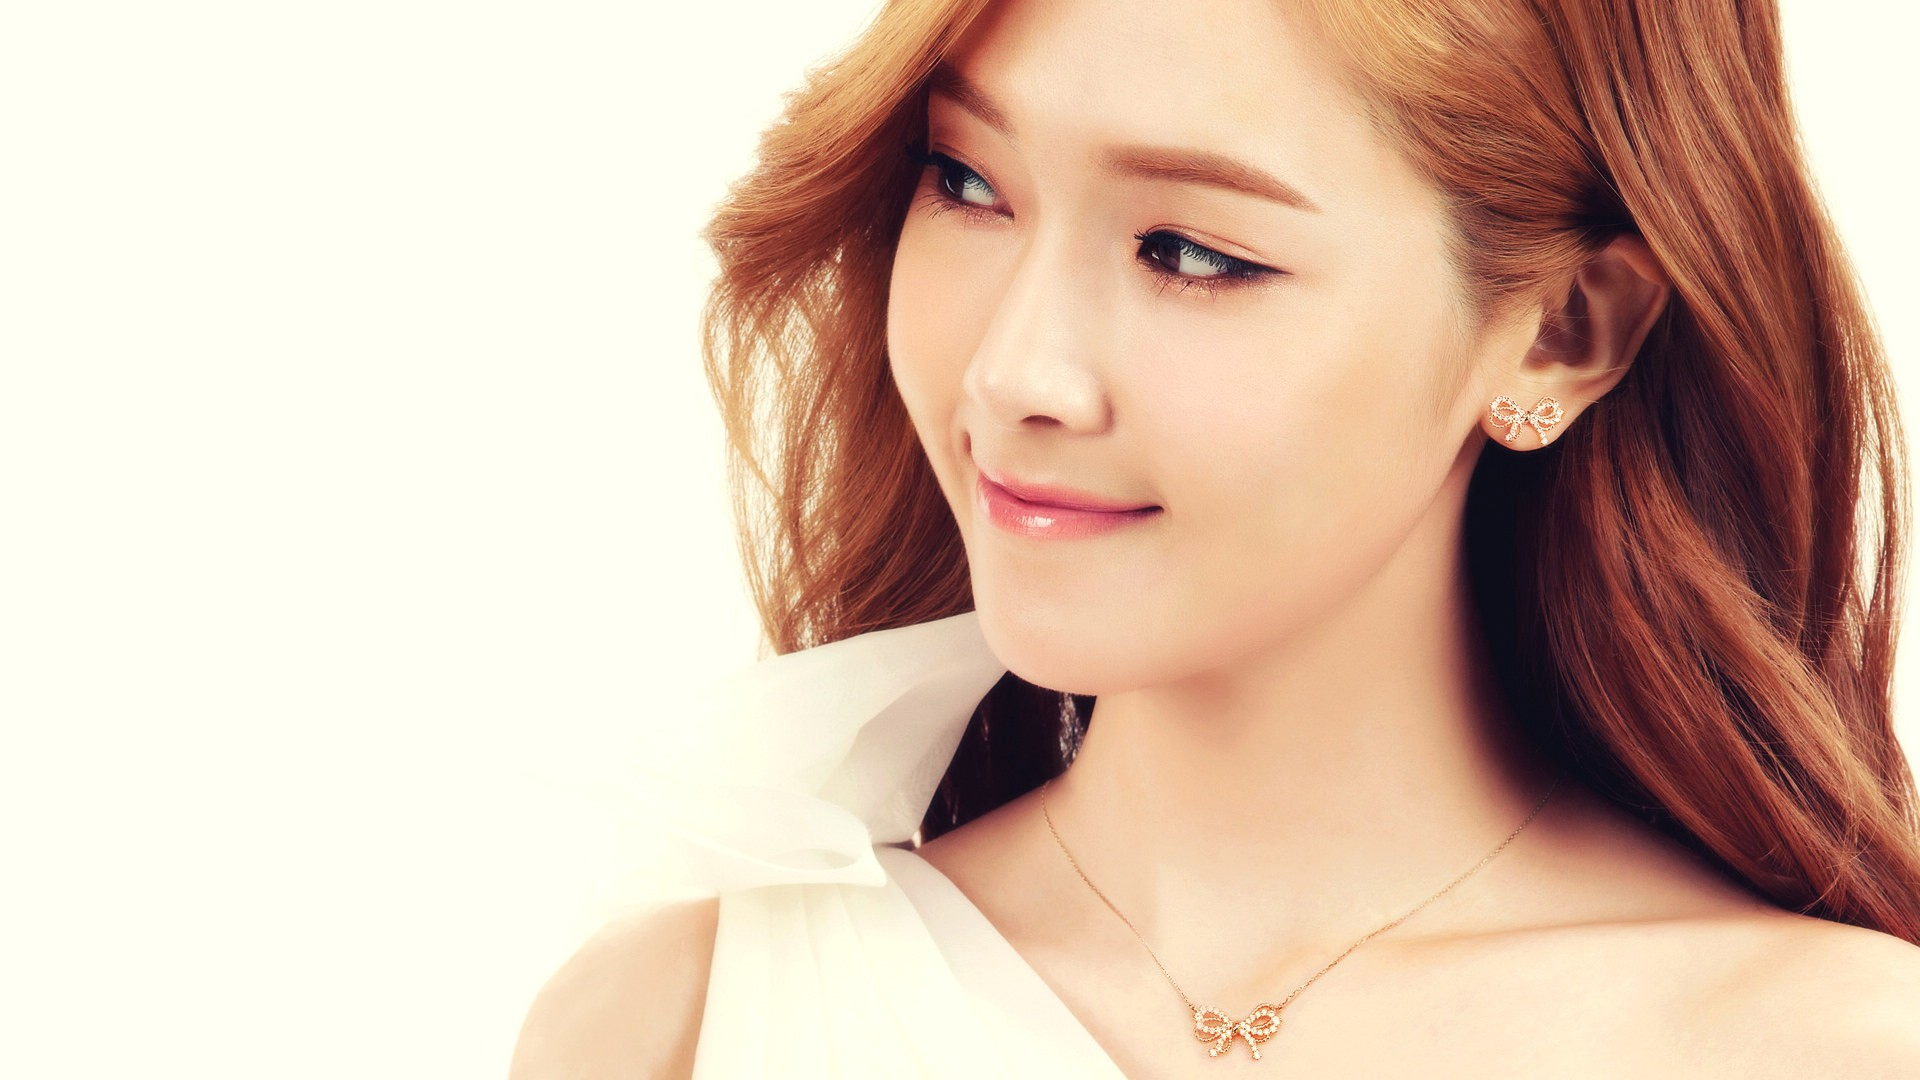 Asian Jessica Jung Girls Generation airbrushed wallpaper 1920x1080